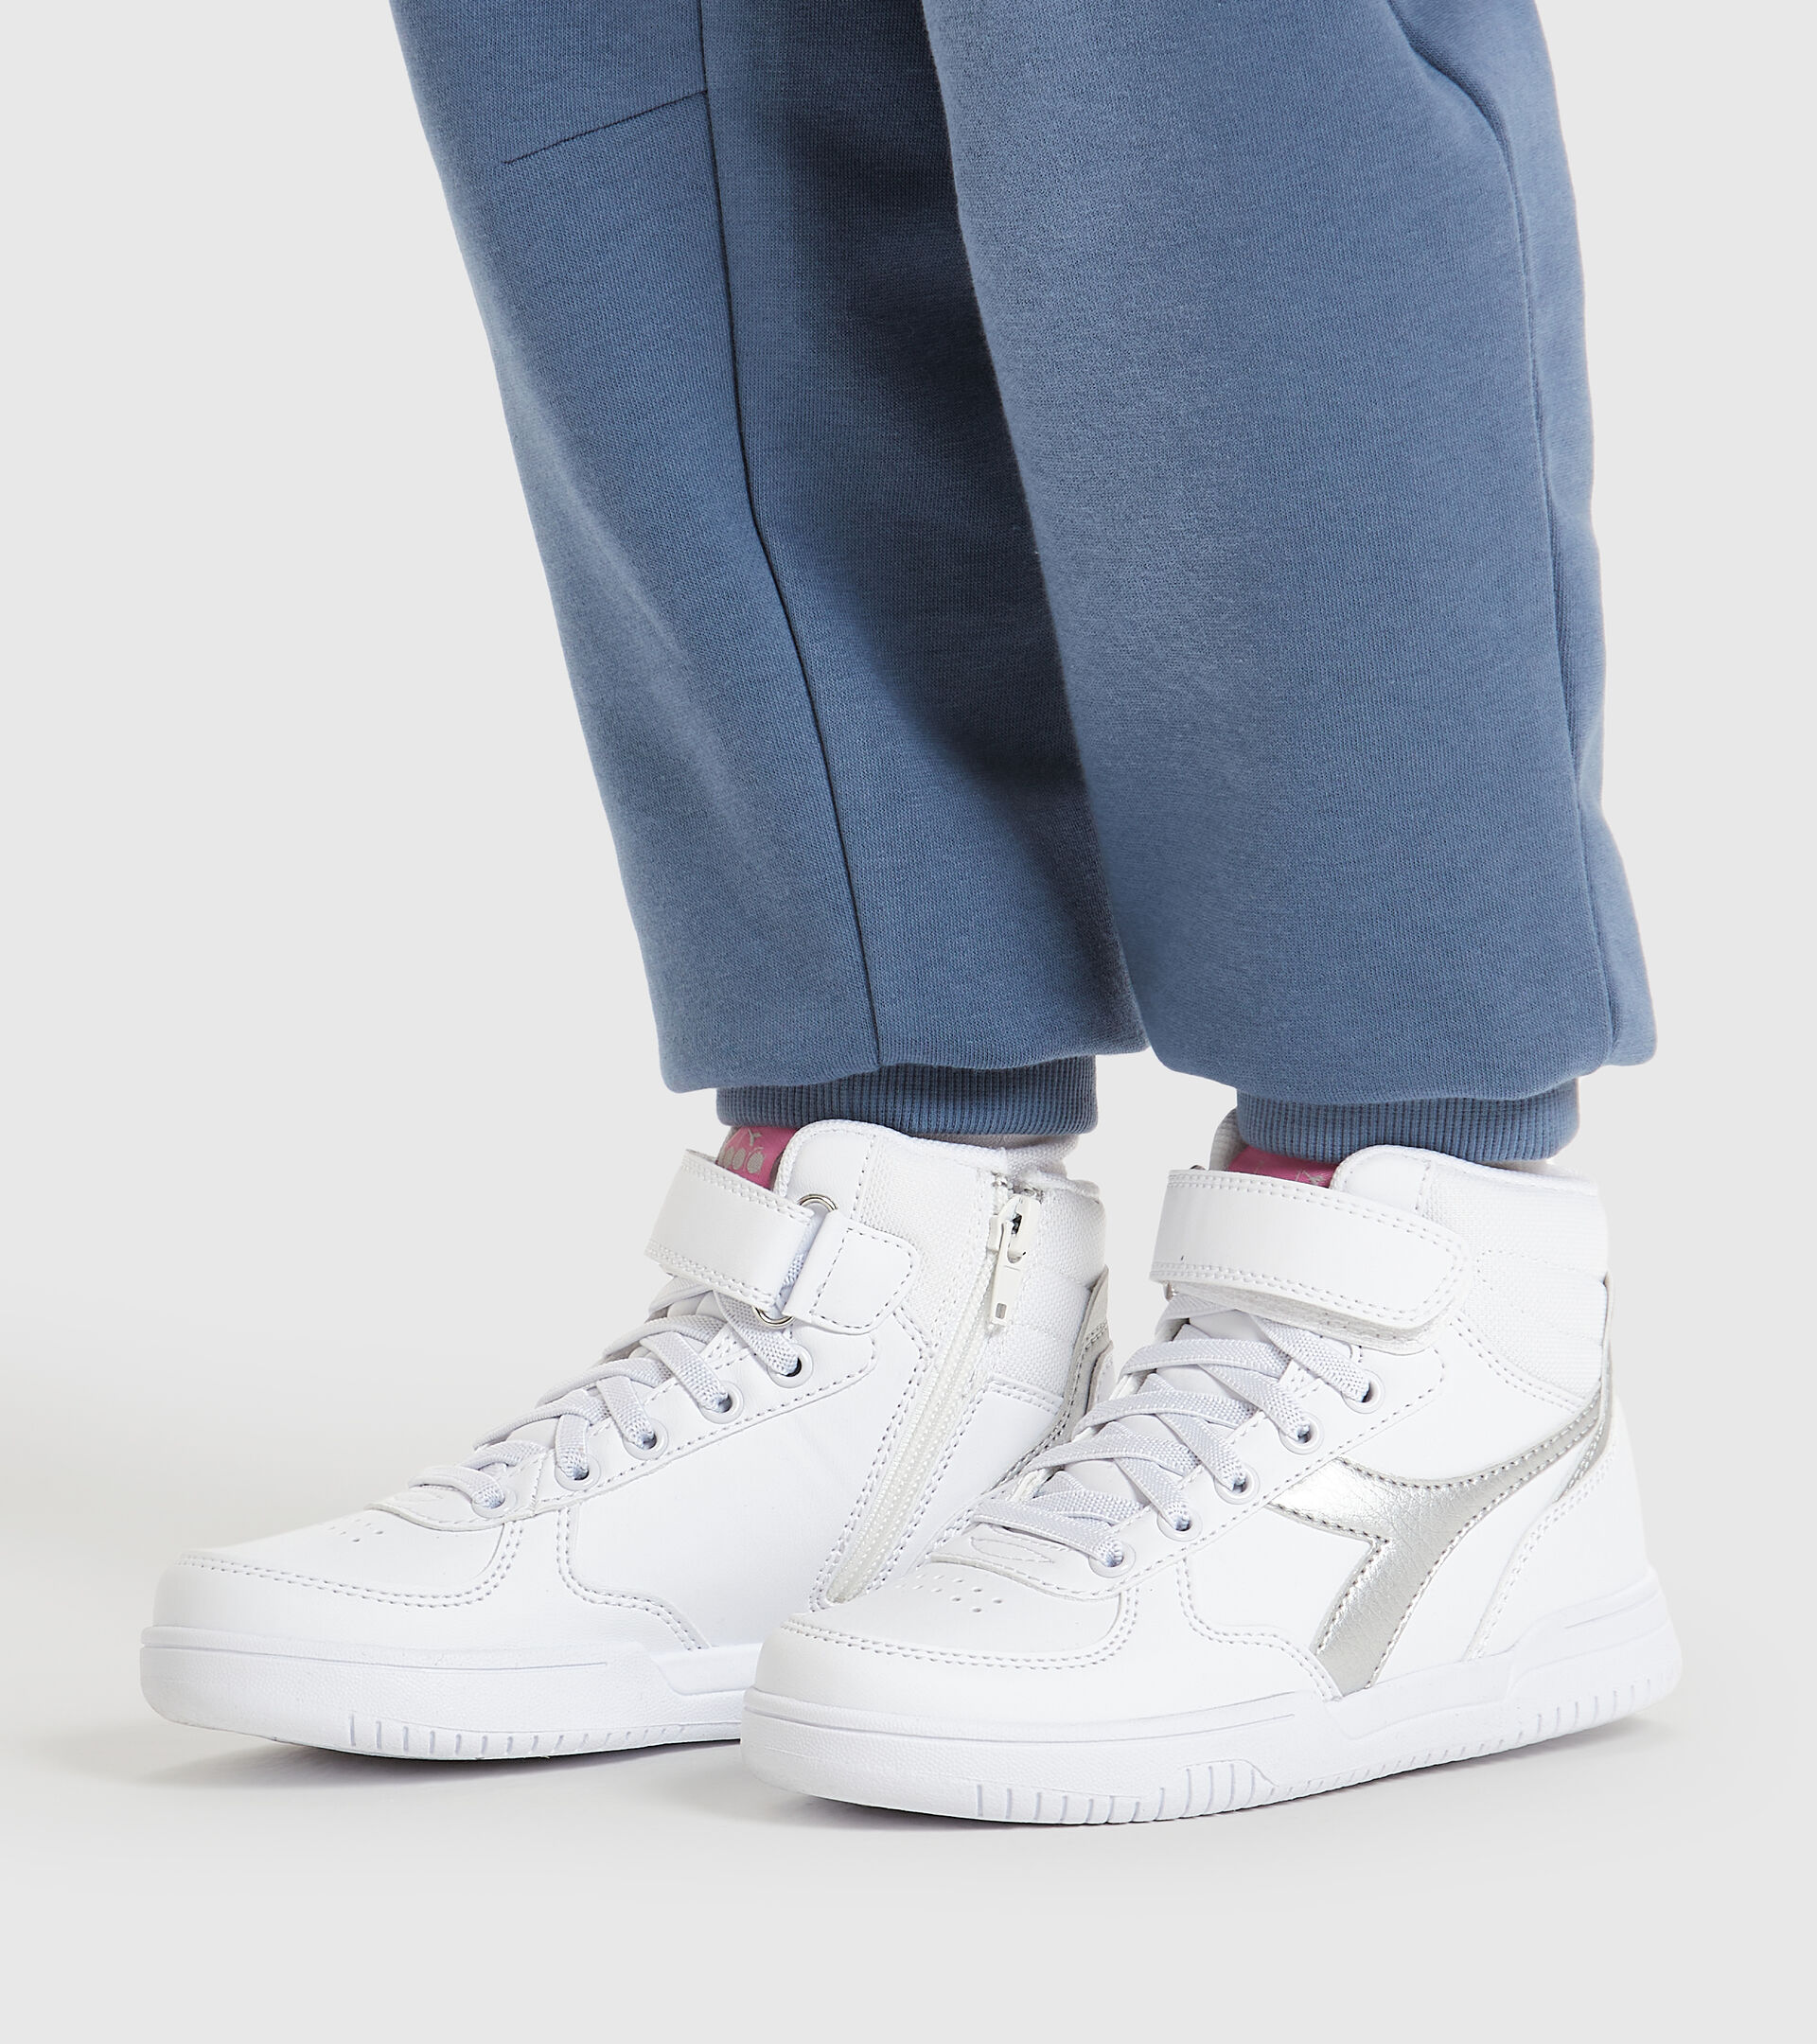 Chaussures de sport - Enfants 4-8 ans RAPTOR MID PS WEISS/ARGENT - Diadora